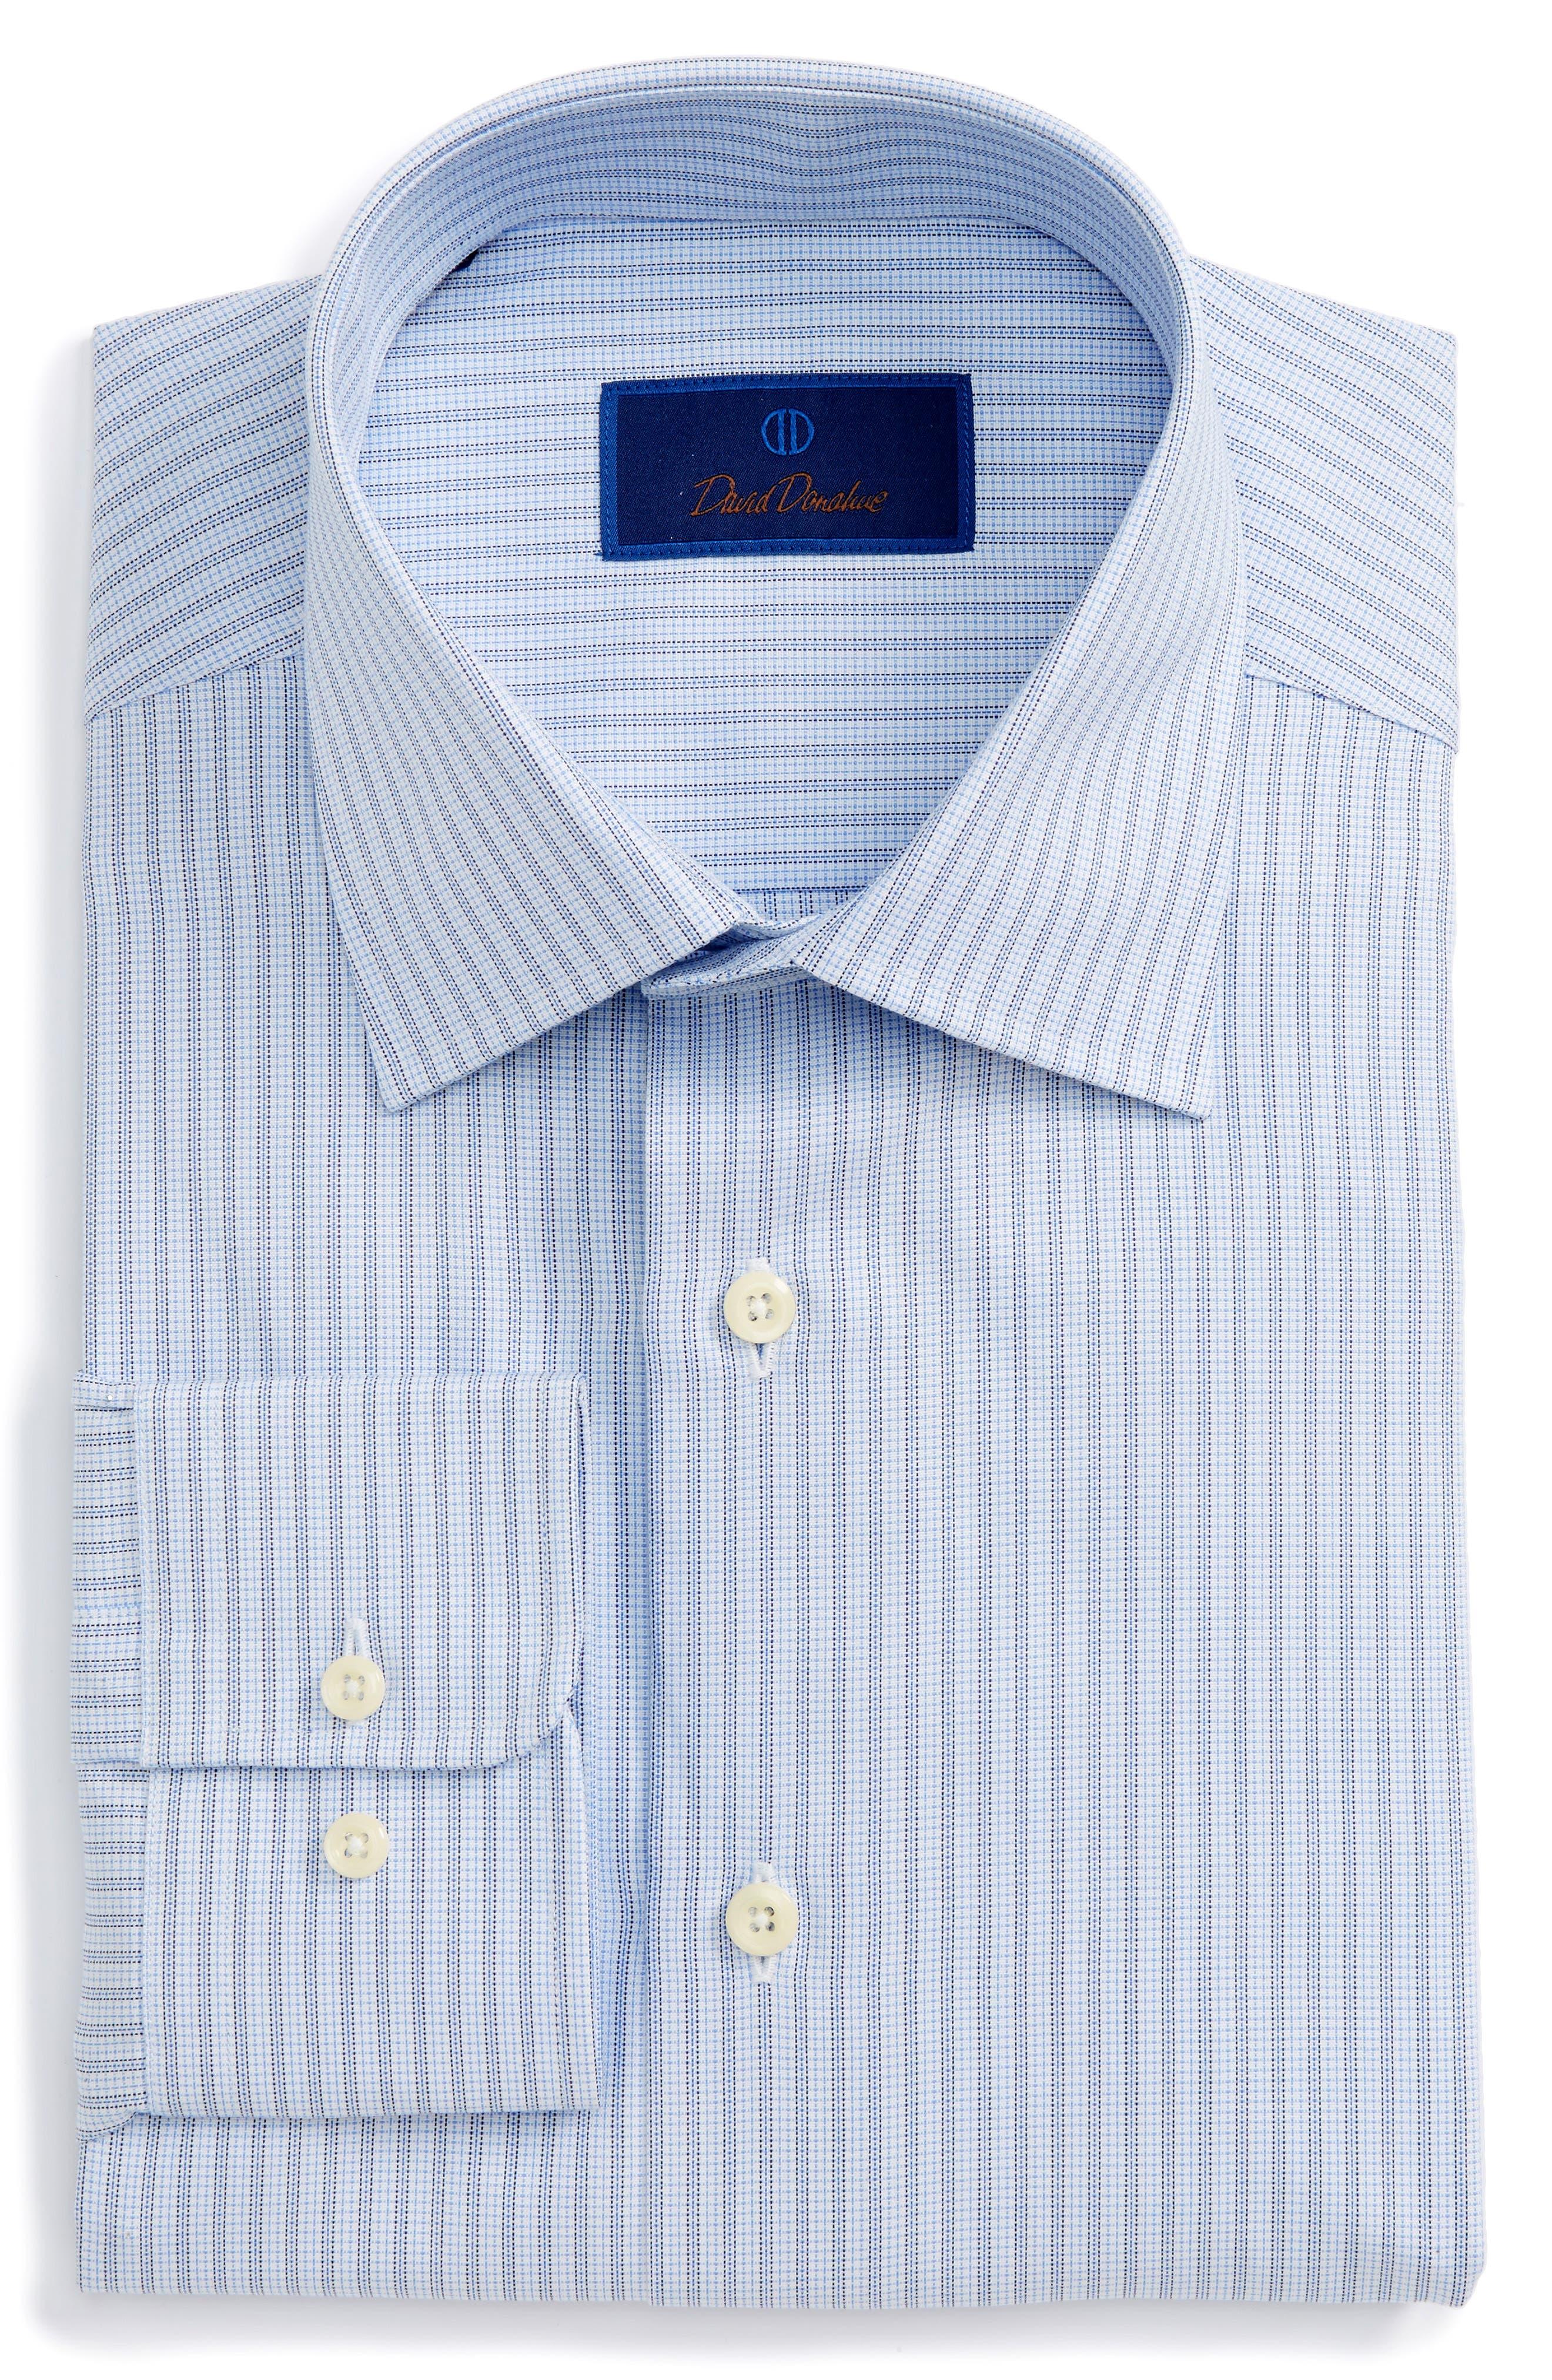 Main Image - David Donahue Regular Fit Stripe Dress Shirt